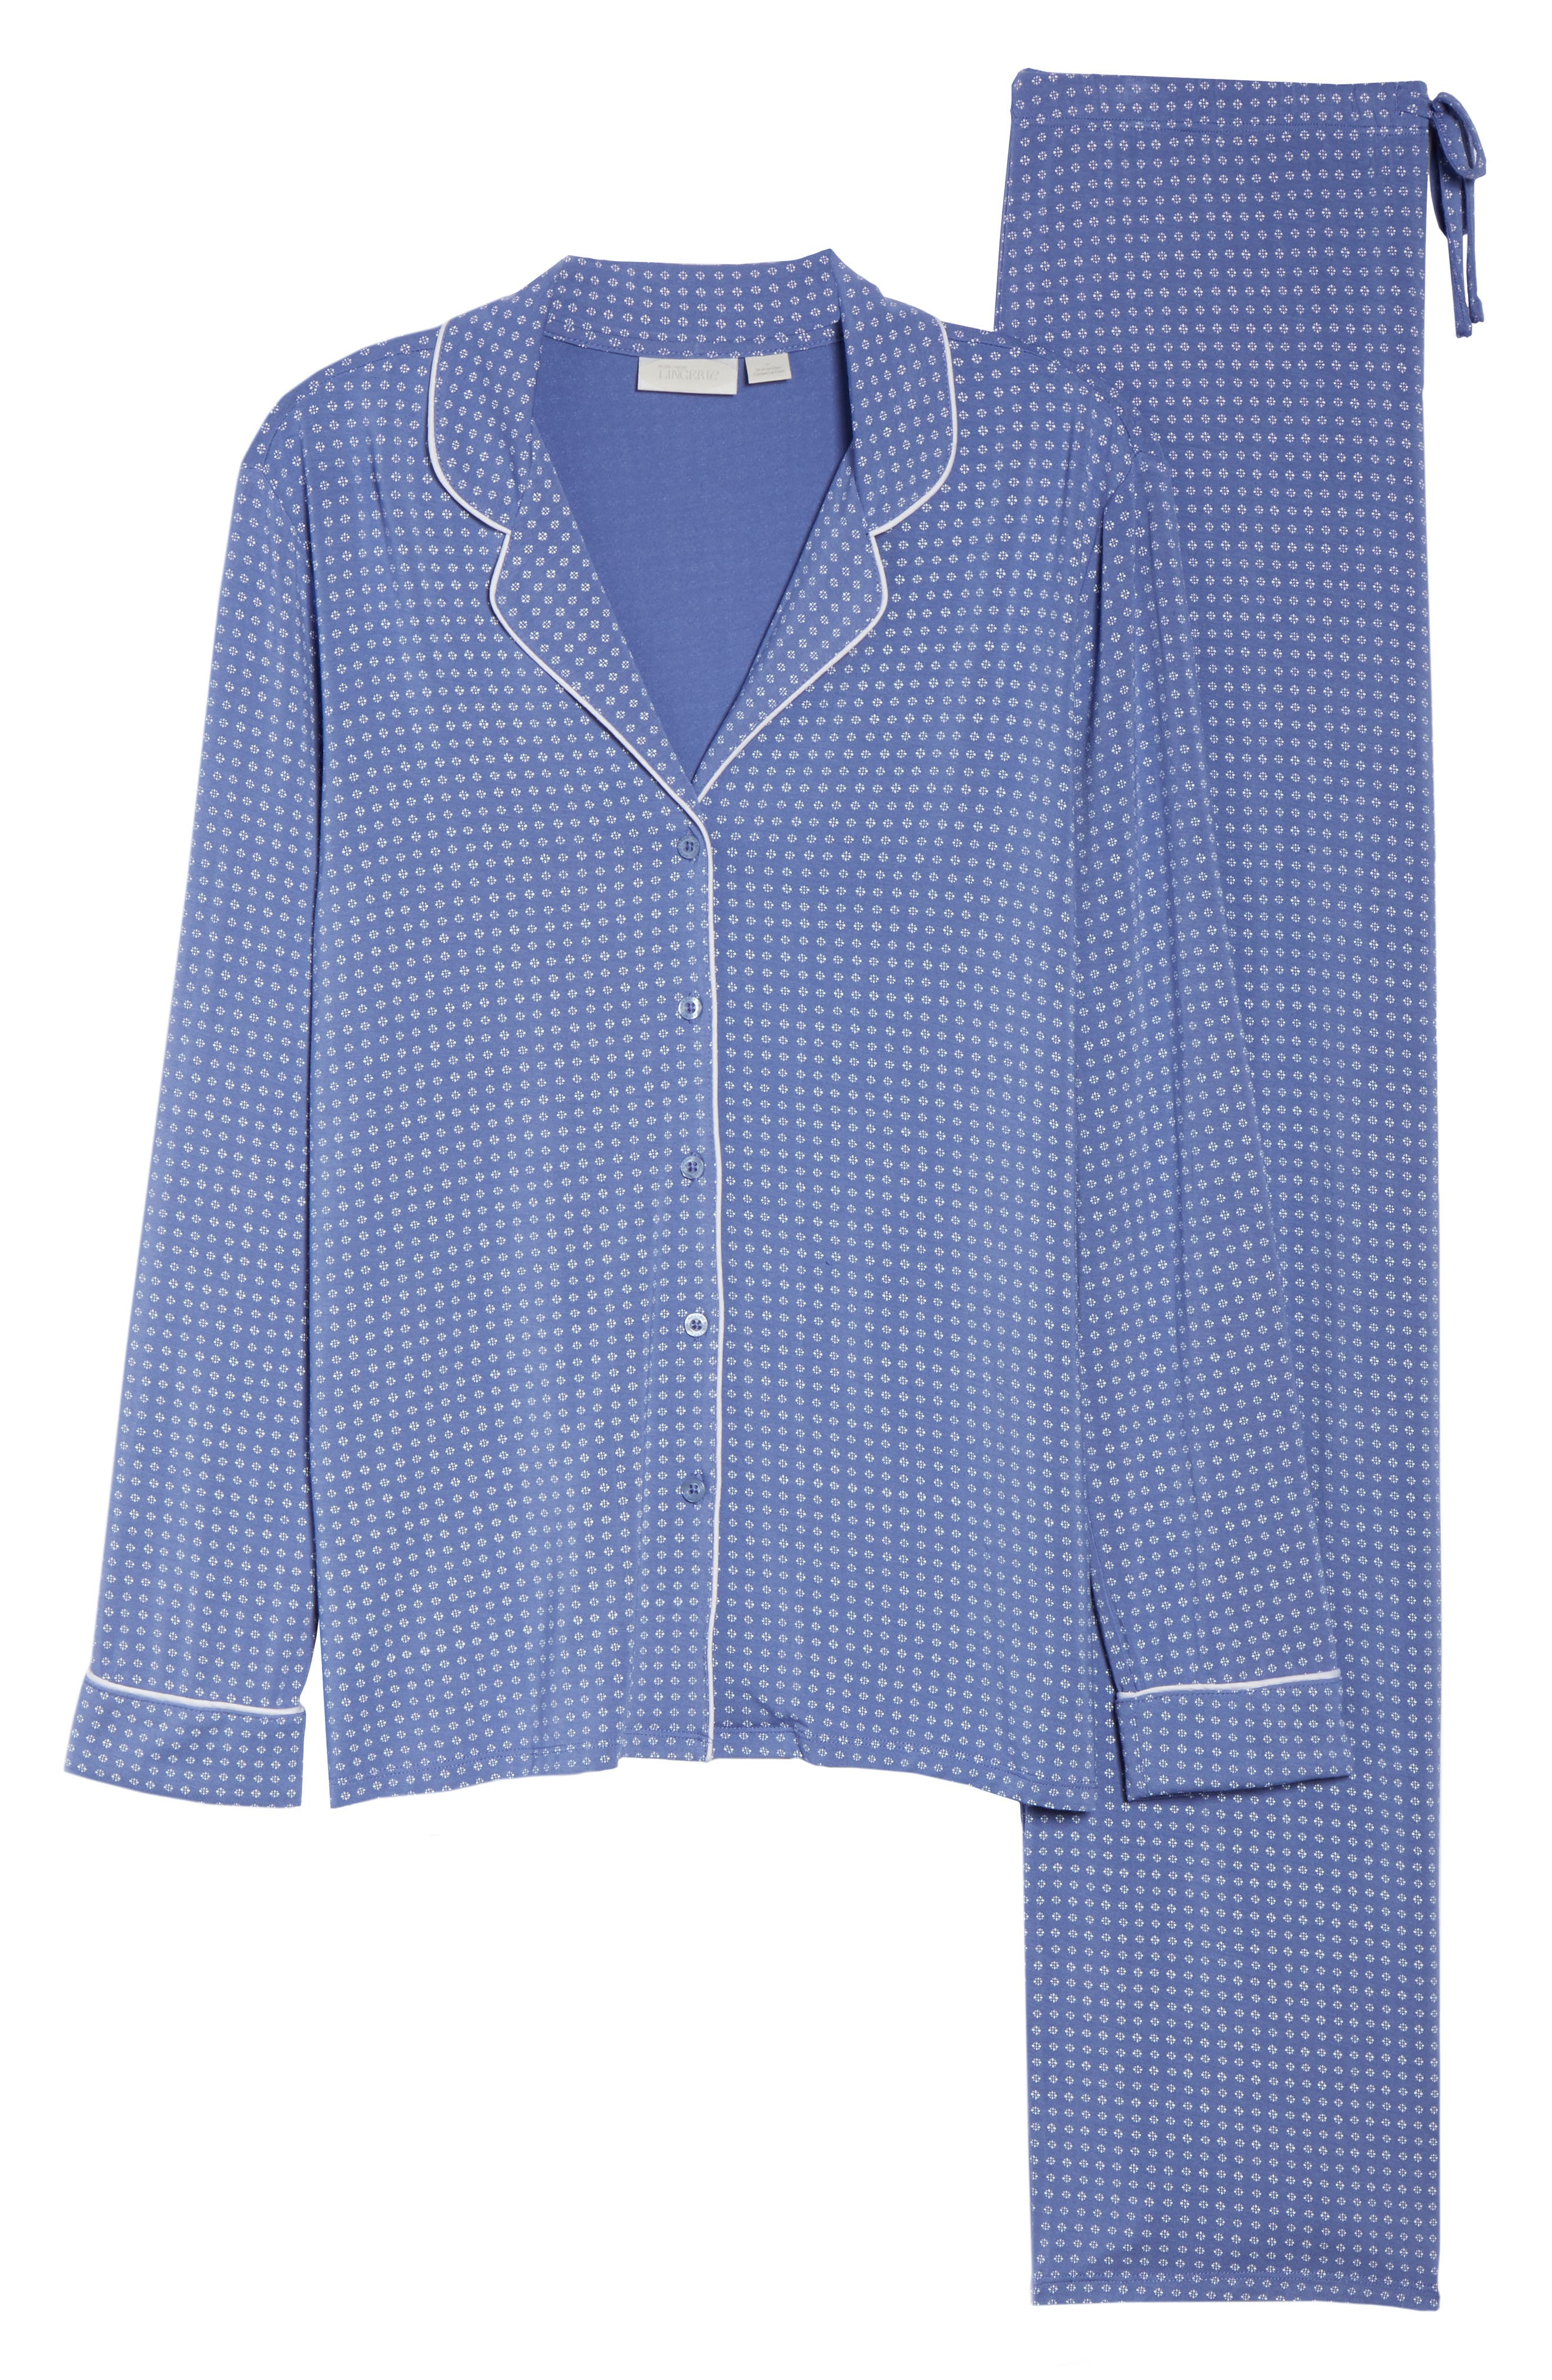 Moonlight Pajamas,                             Alternate thumbnail 6, color,                             Blue Denim Geo